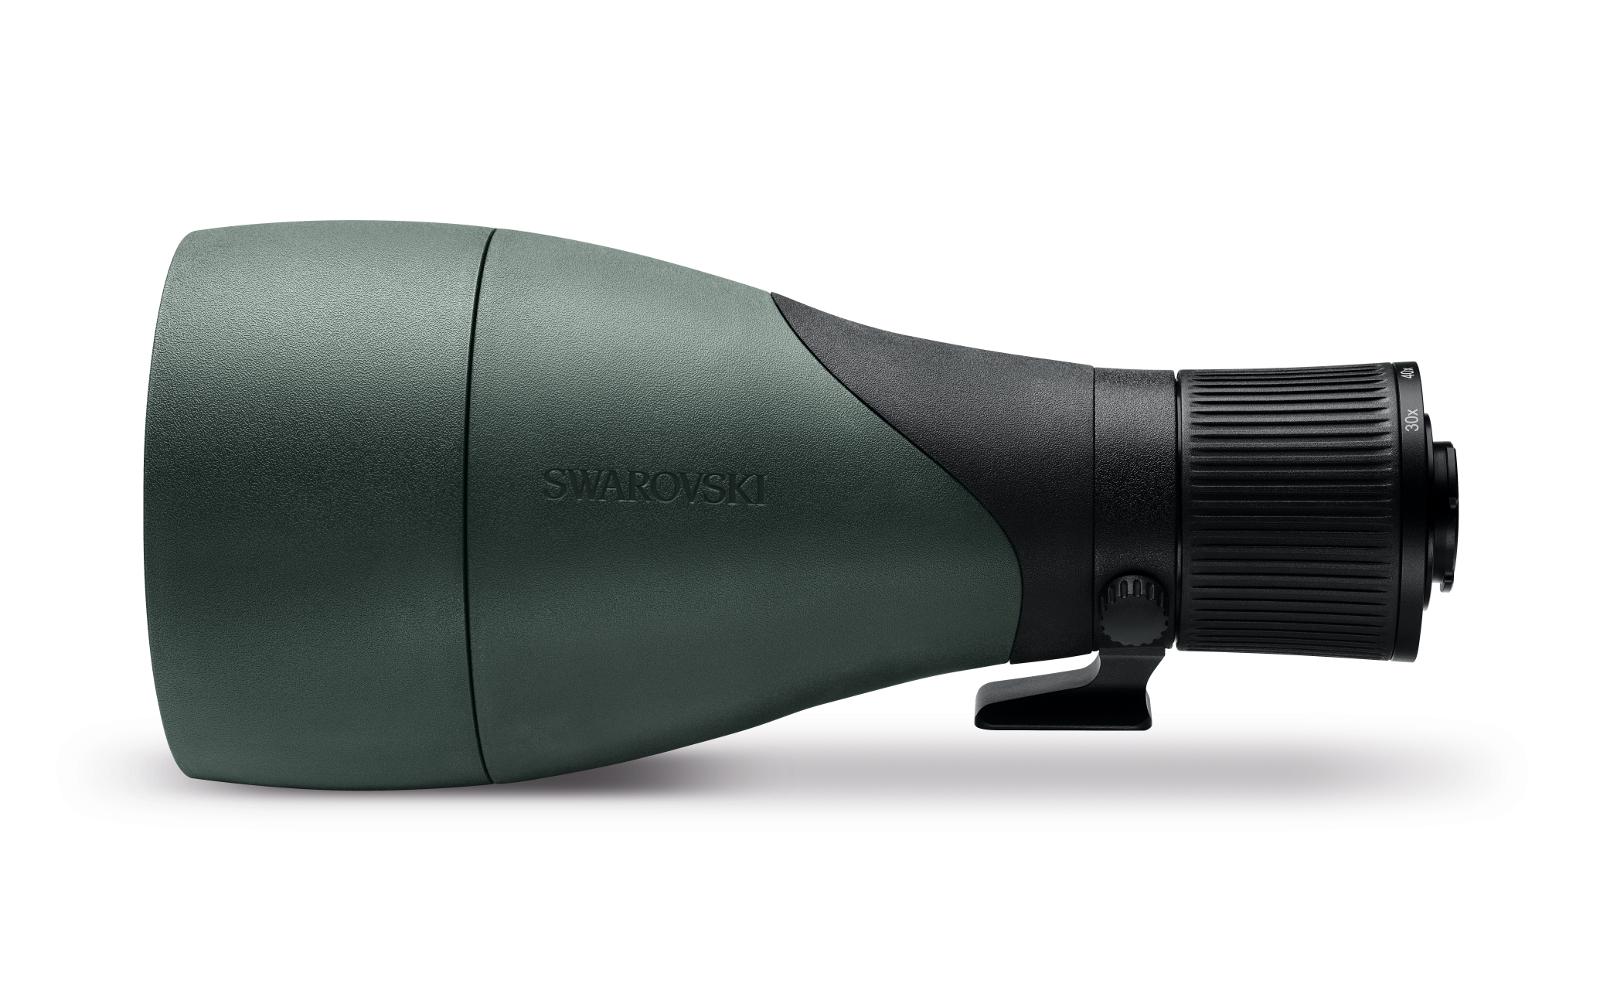 obiettivo swarovski so pr 115 mm